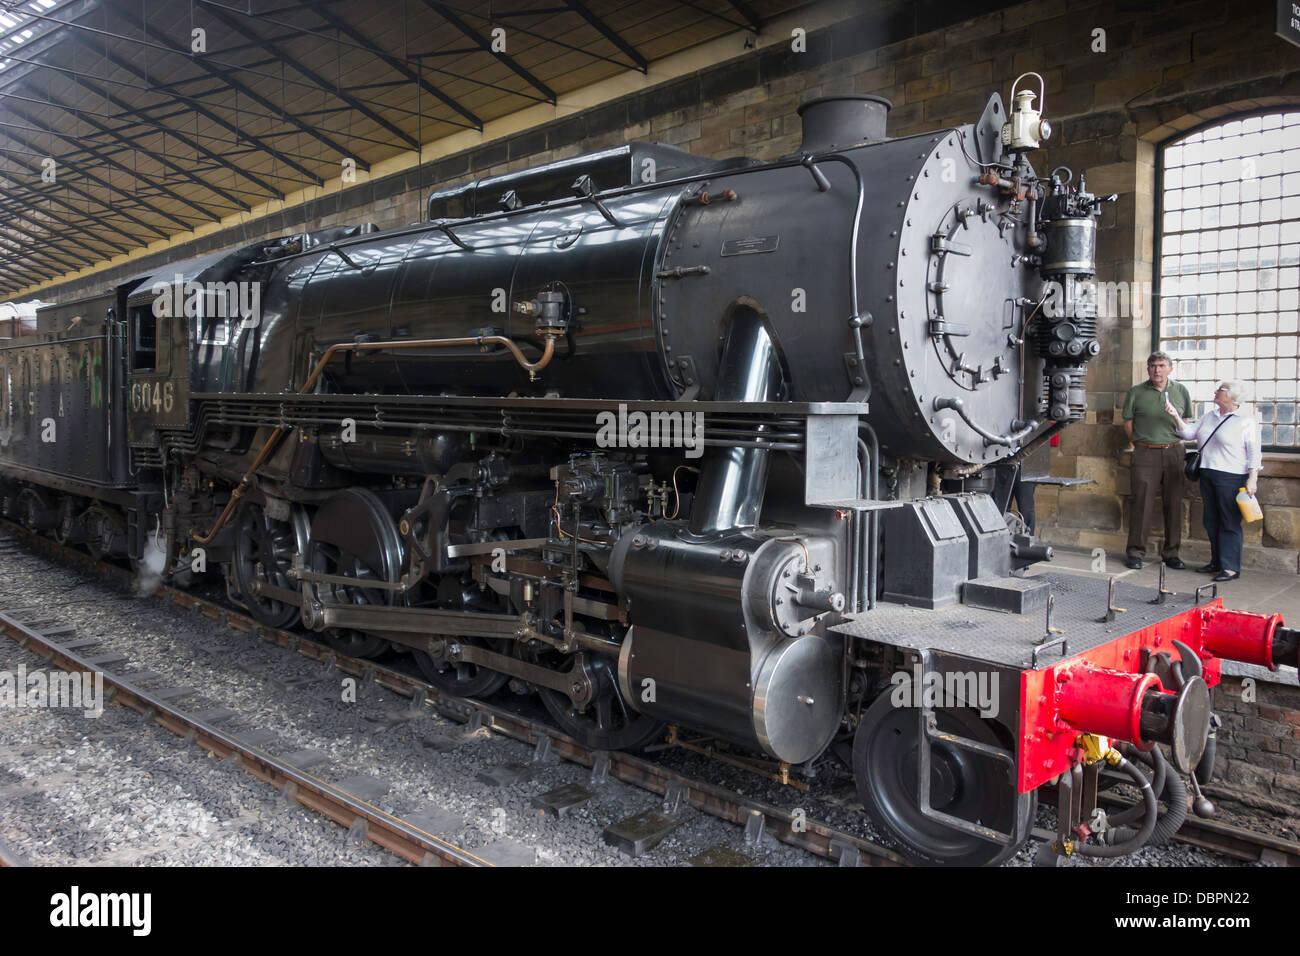 american steam trains video - photo #40